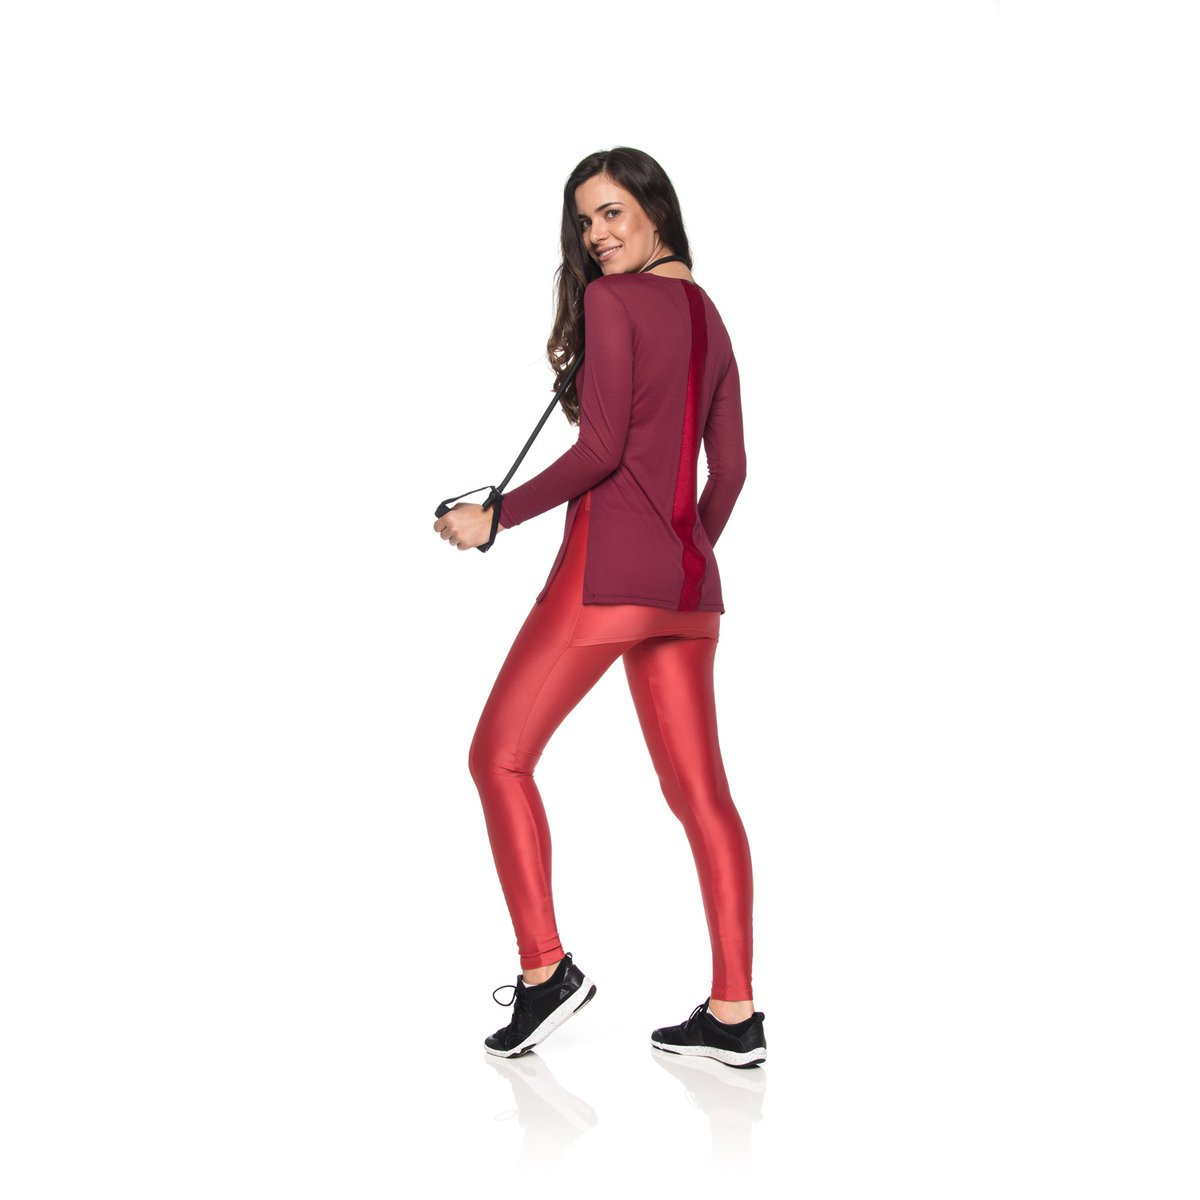 Cover Claro P Fitness Claro Marsala Claro Marsala Leggings Legging Laranja Cover Fitness zpFqwgPYw